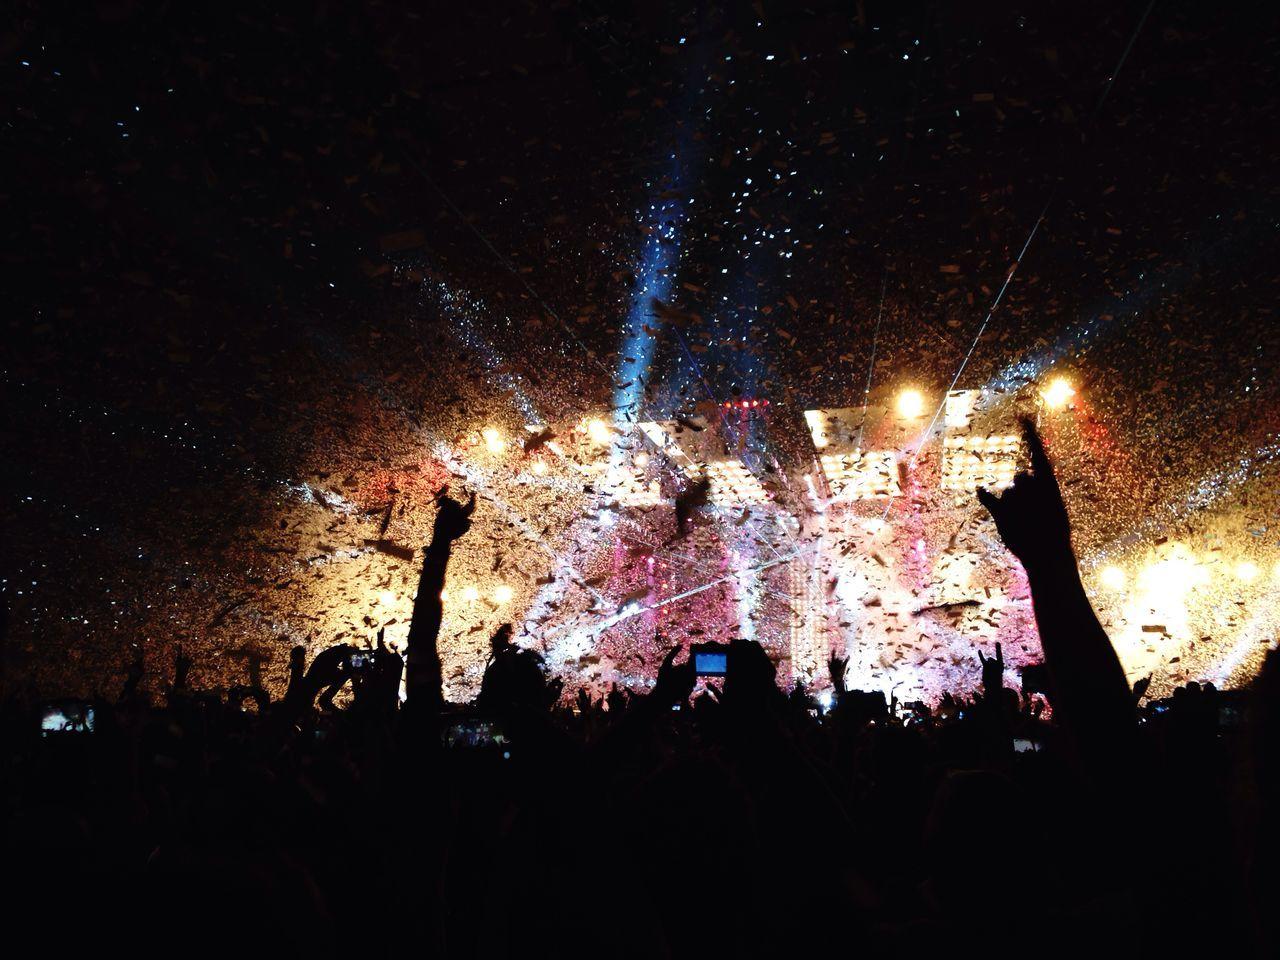 Concert Music Live Music Kiss People Dancing Rock Rock Concert Music Festival KISS Palacio de los deportes Madrid